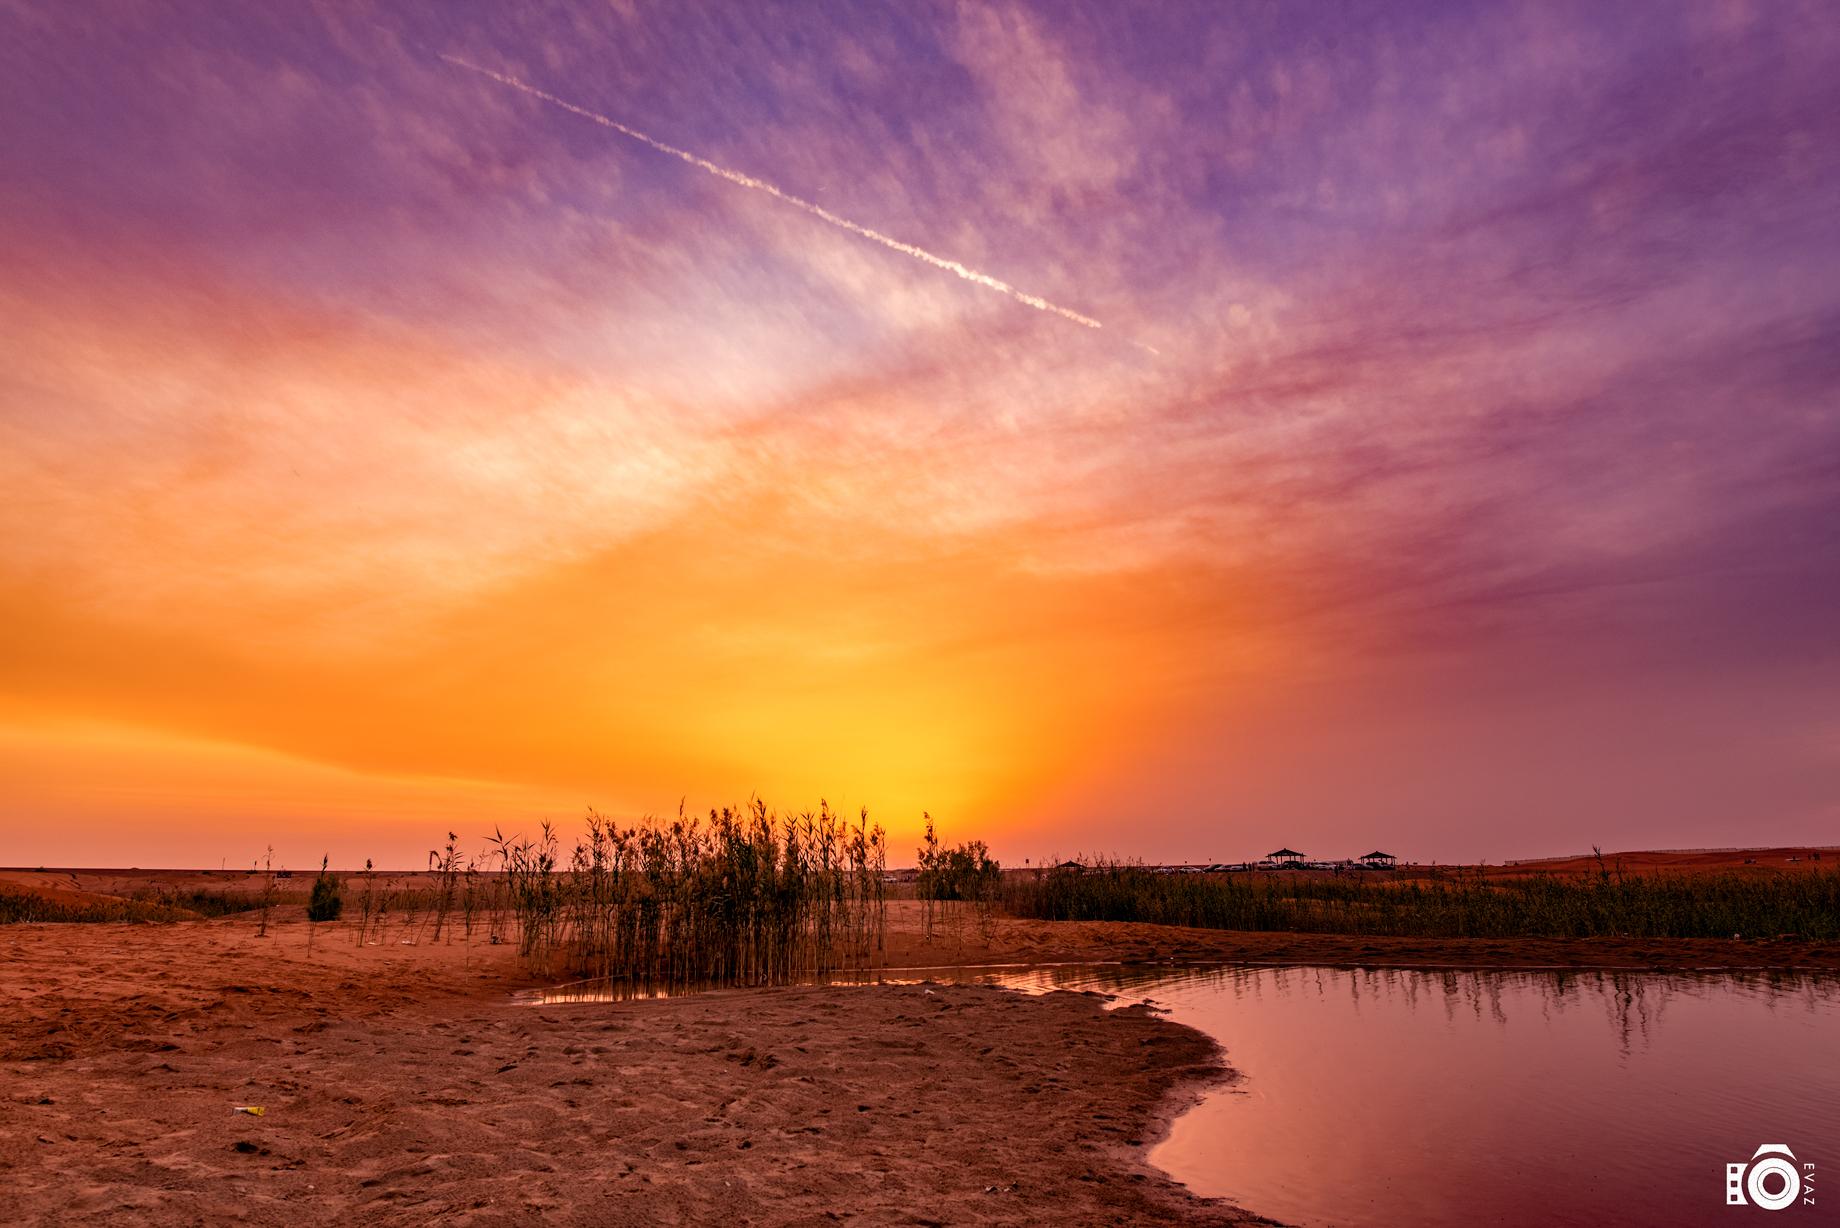 Sunset at Zakher